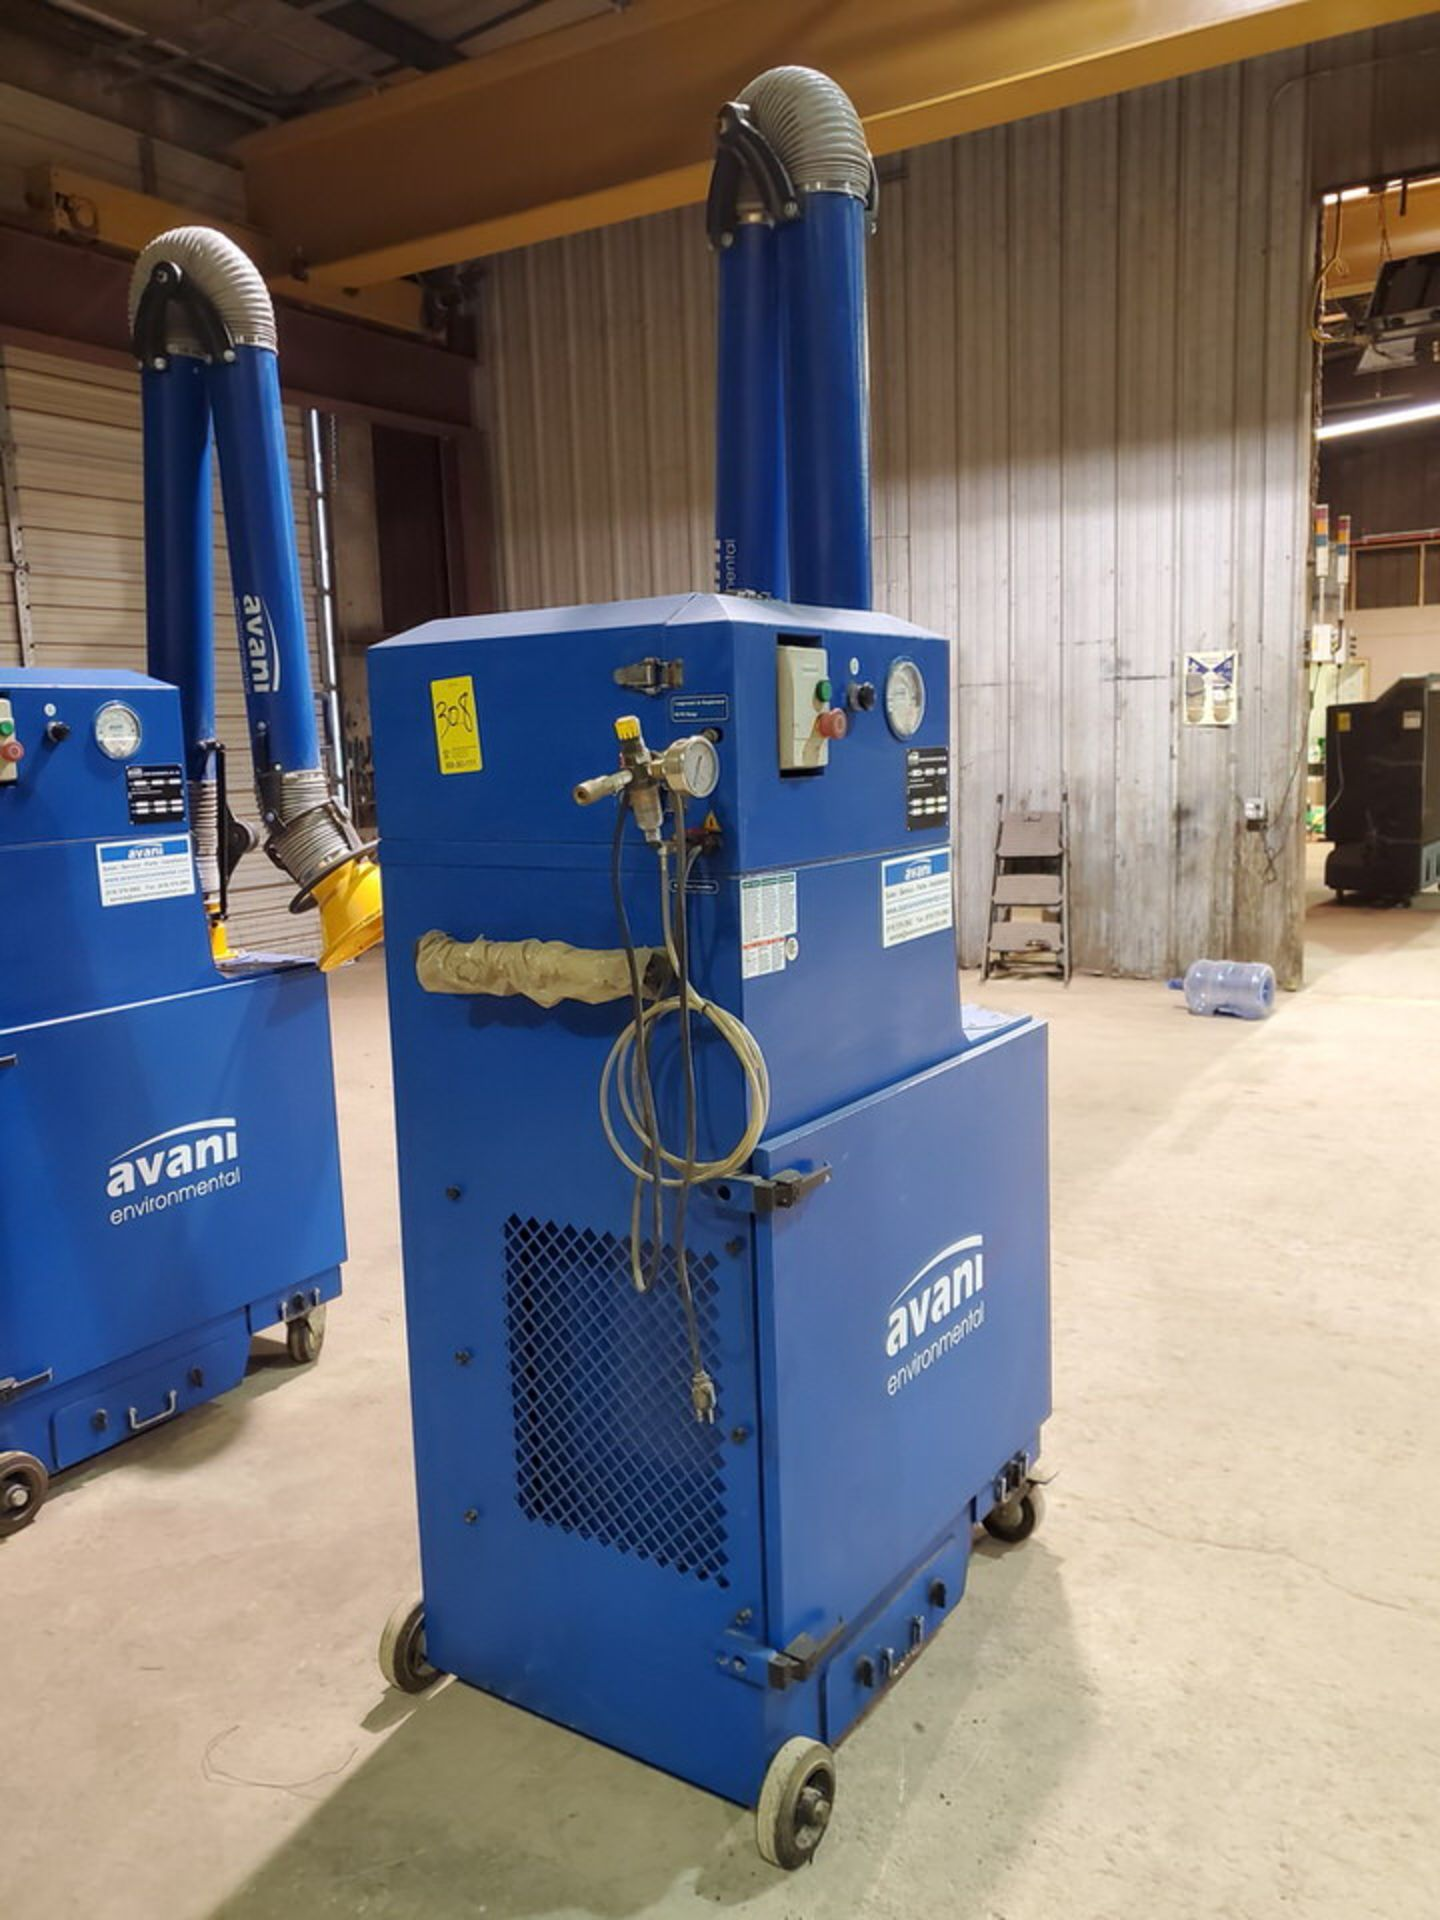 2017 Avanti SPC-2000 Portable Dust Collector 1-1/2HP, 120V, 60HZ, 1PH, 14A, 3450RPM